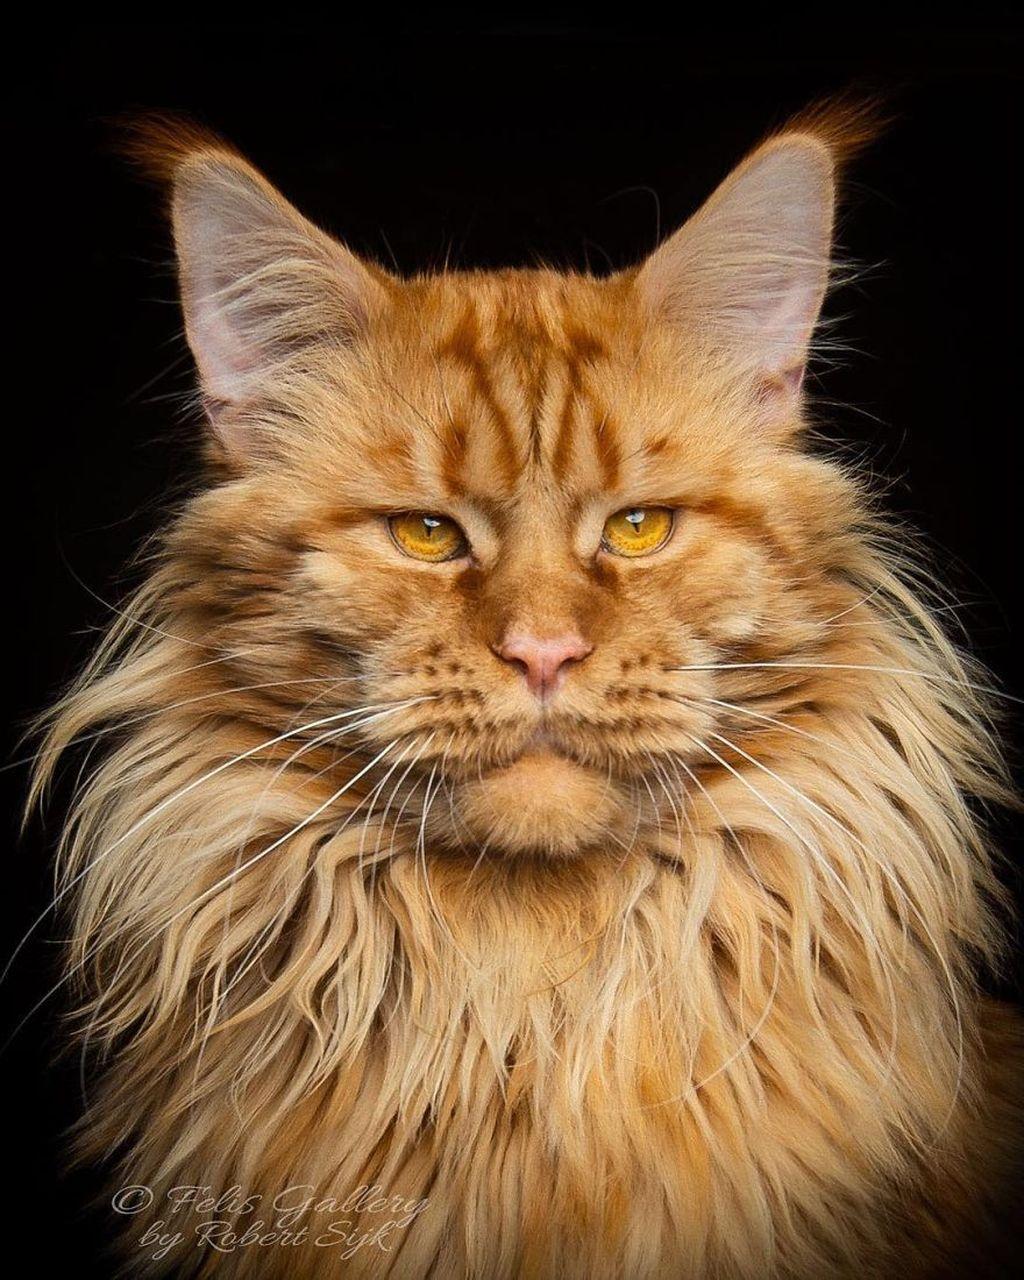 Kucing ini memiliki bentuk wajah yang kuat dengan bulu-bulu panjang yang lebat. (Foto: Robert Sijka)